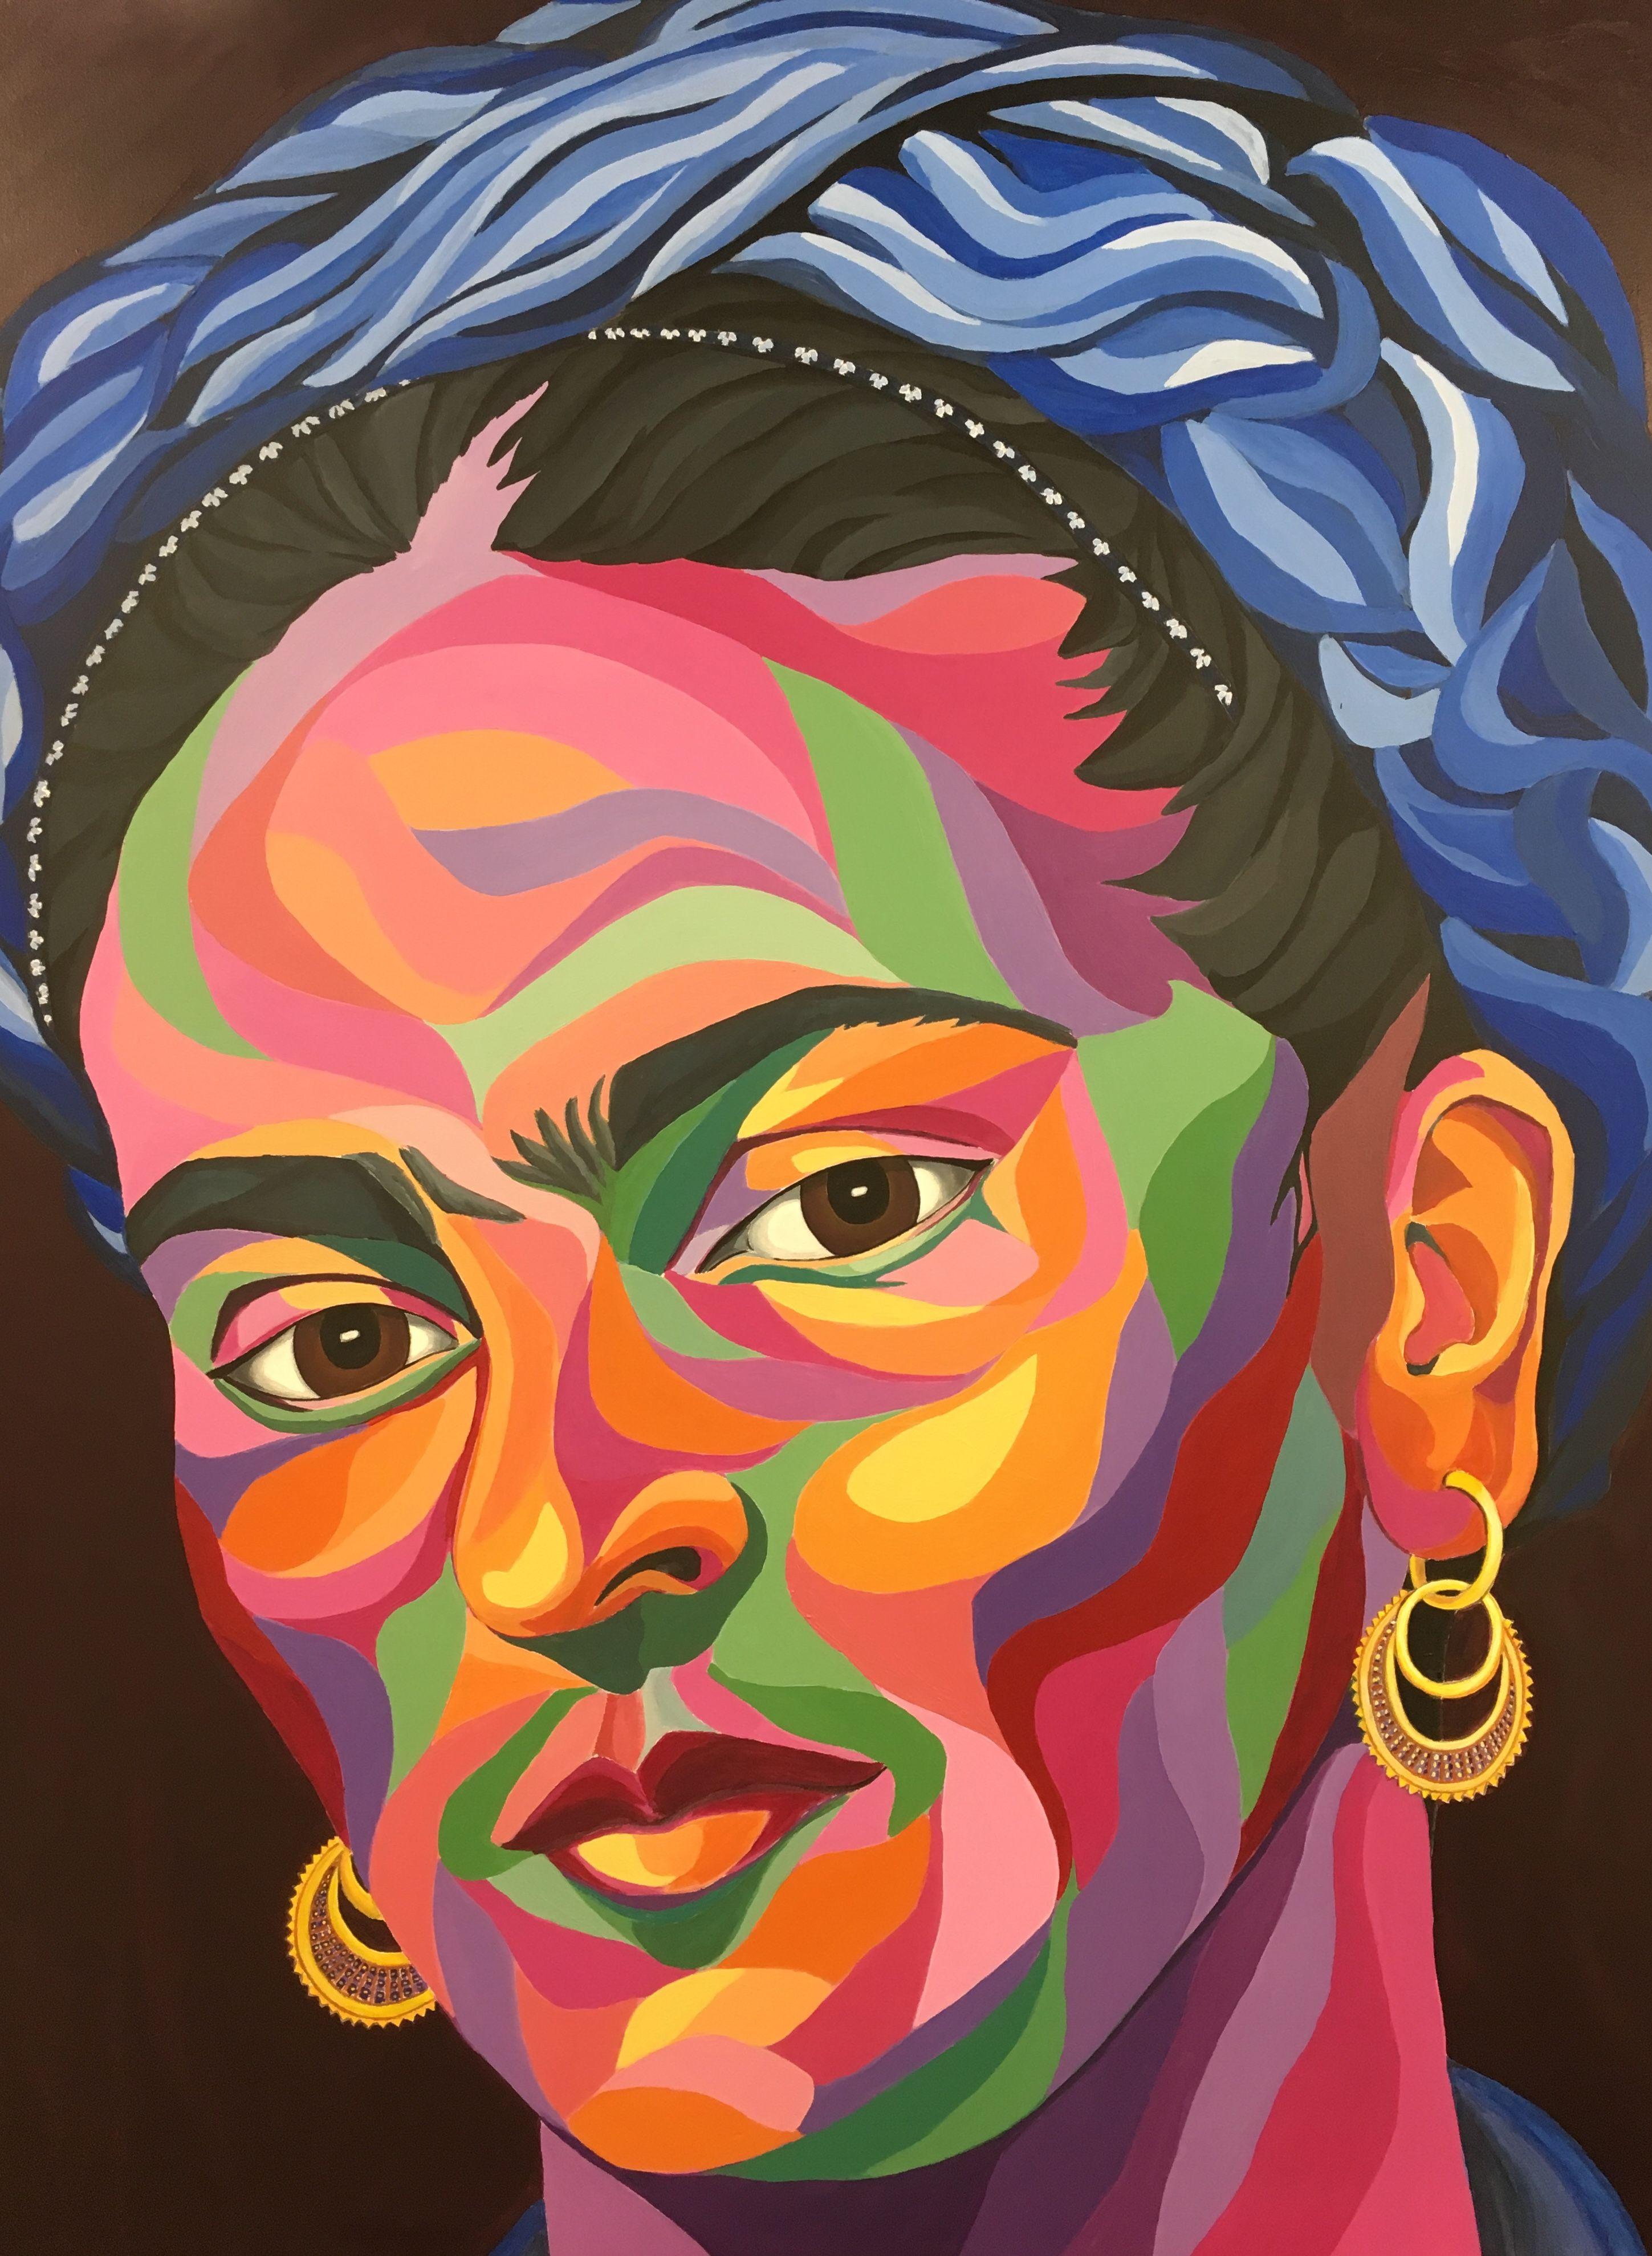 » Did Frida Kahlo have Fibromyalgia?